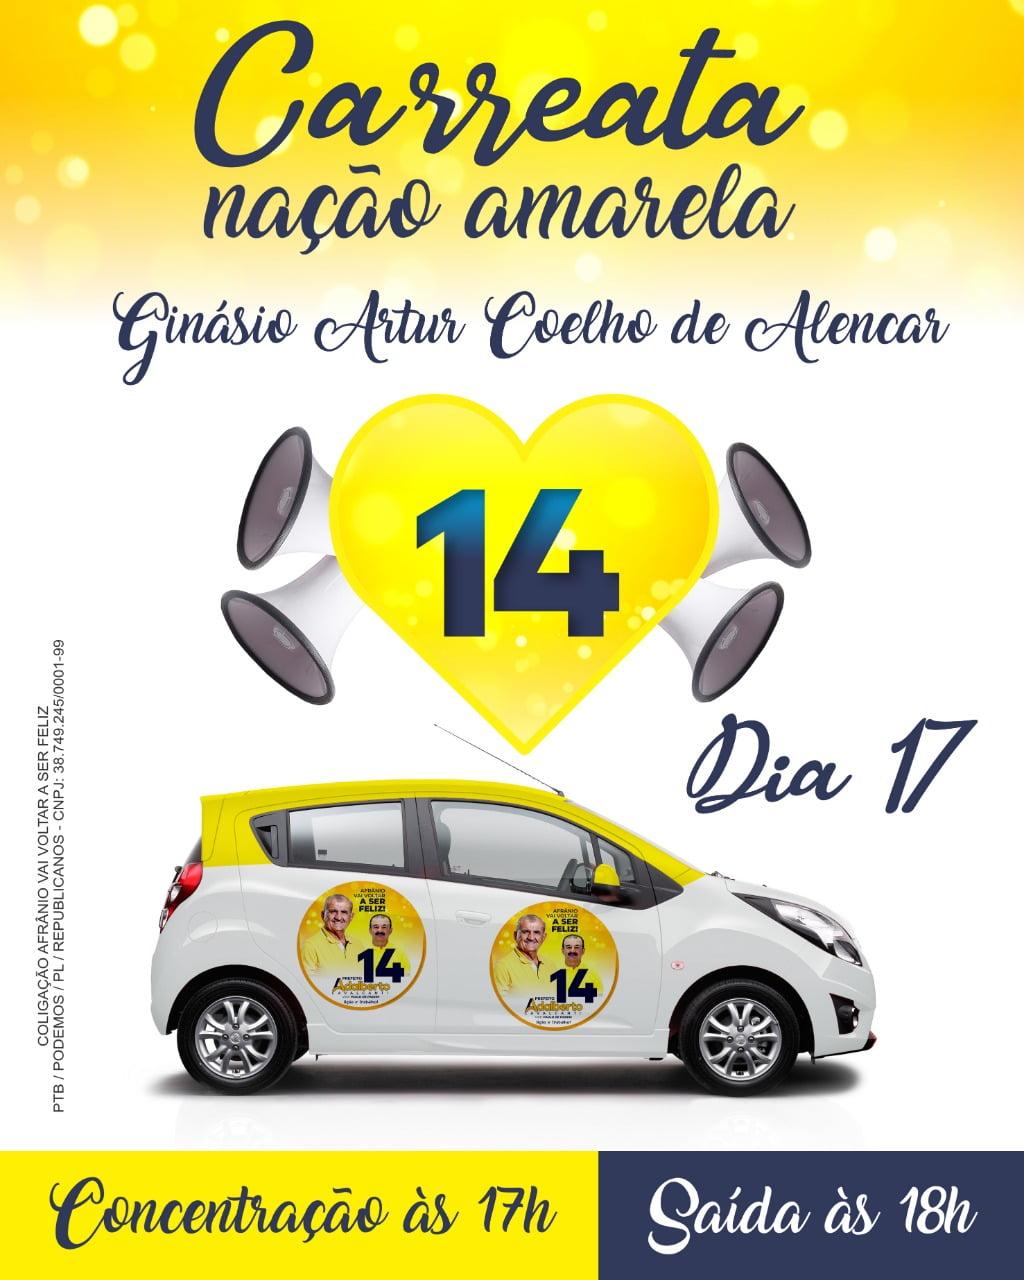 Adalberto Cavalcanti e Paulo de Passim preparam Carreata 14 pelas ruas de Afrânio nesta sábado